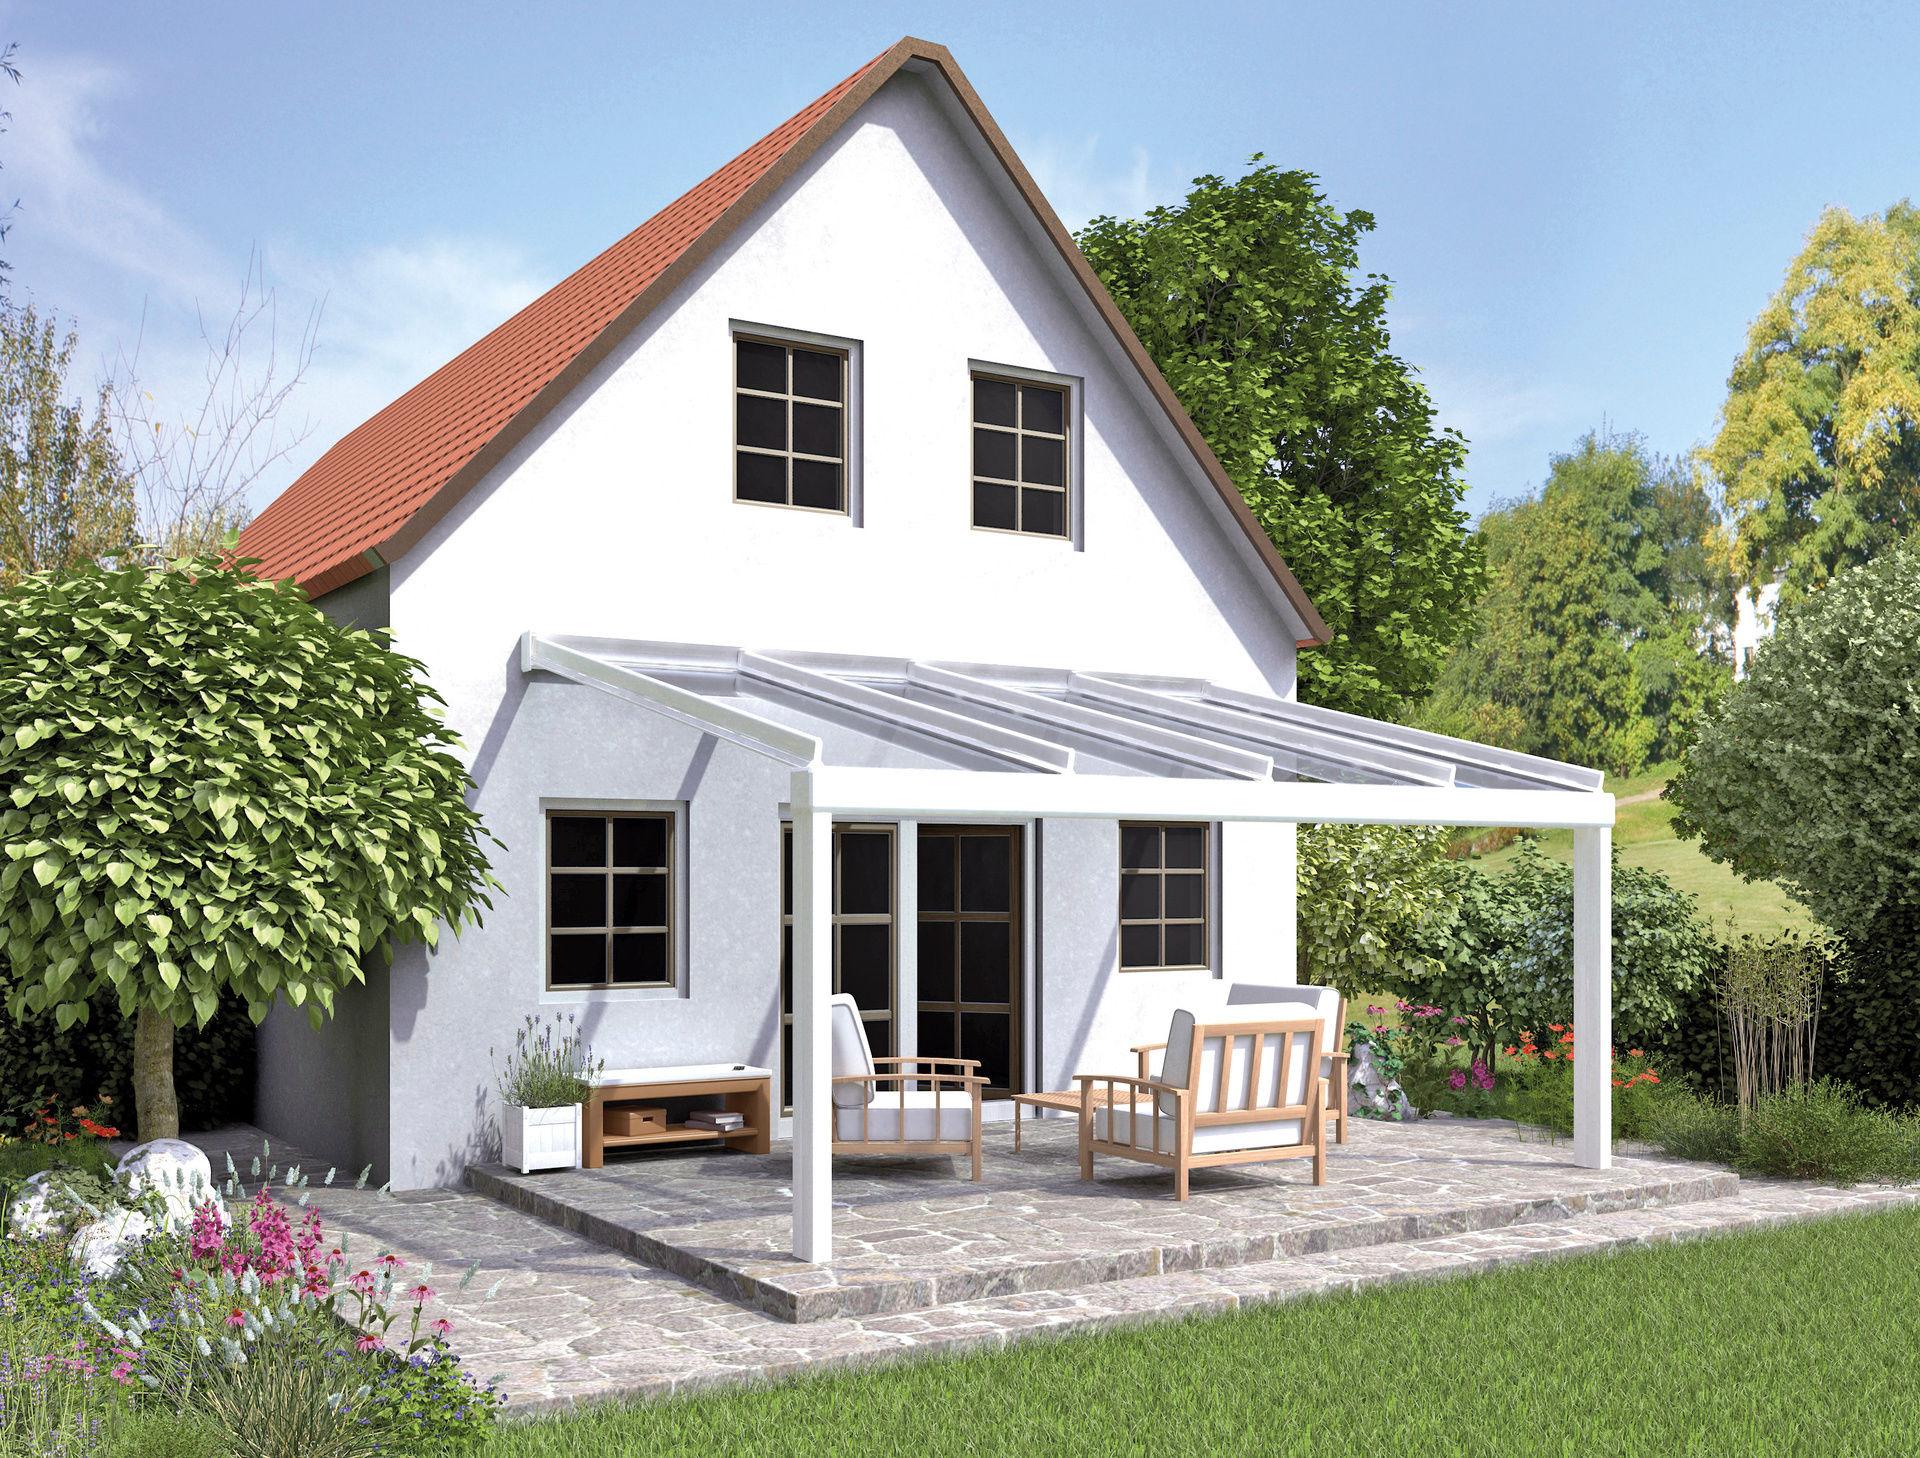 Terrassenüberdachung weiß